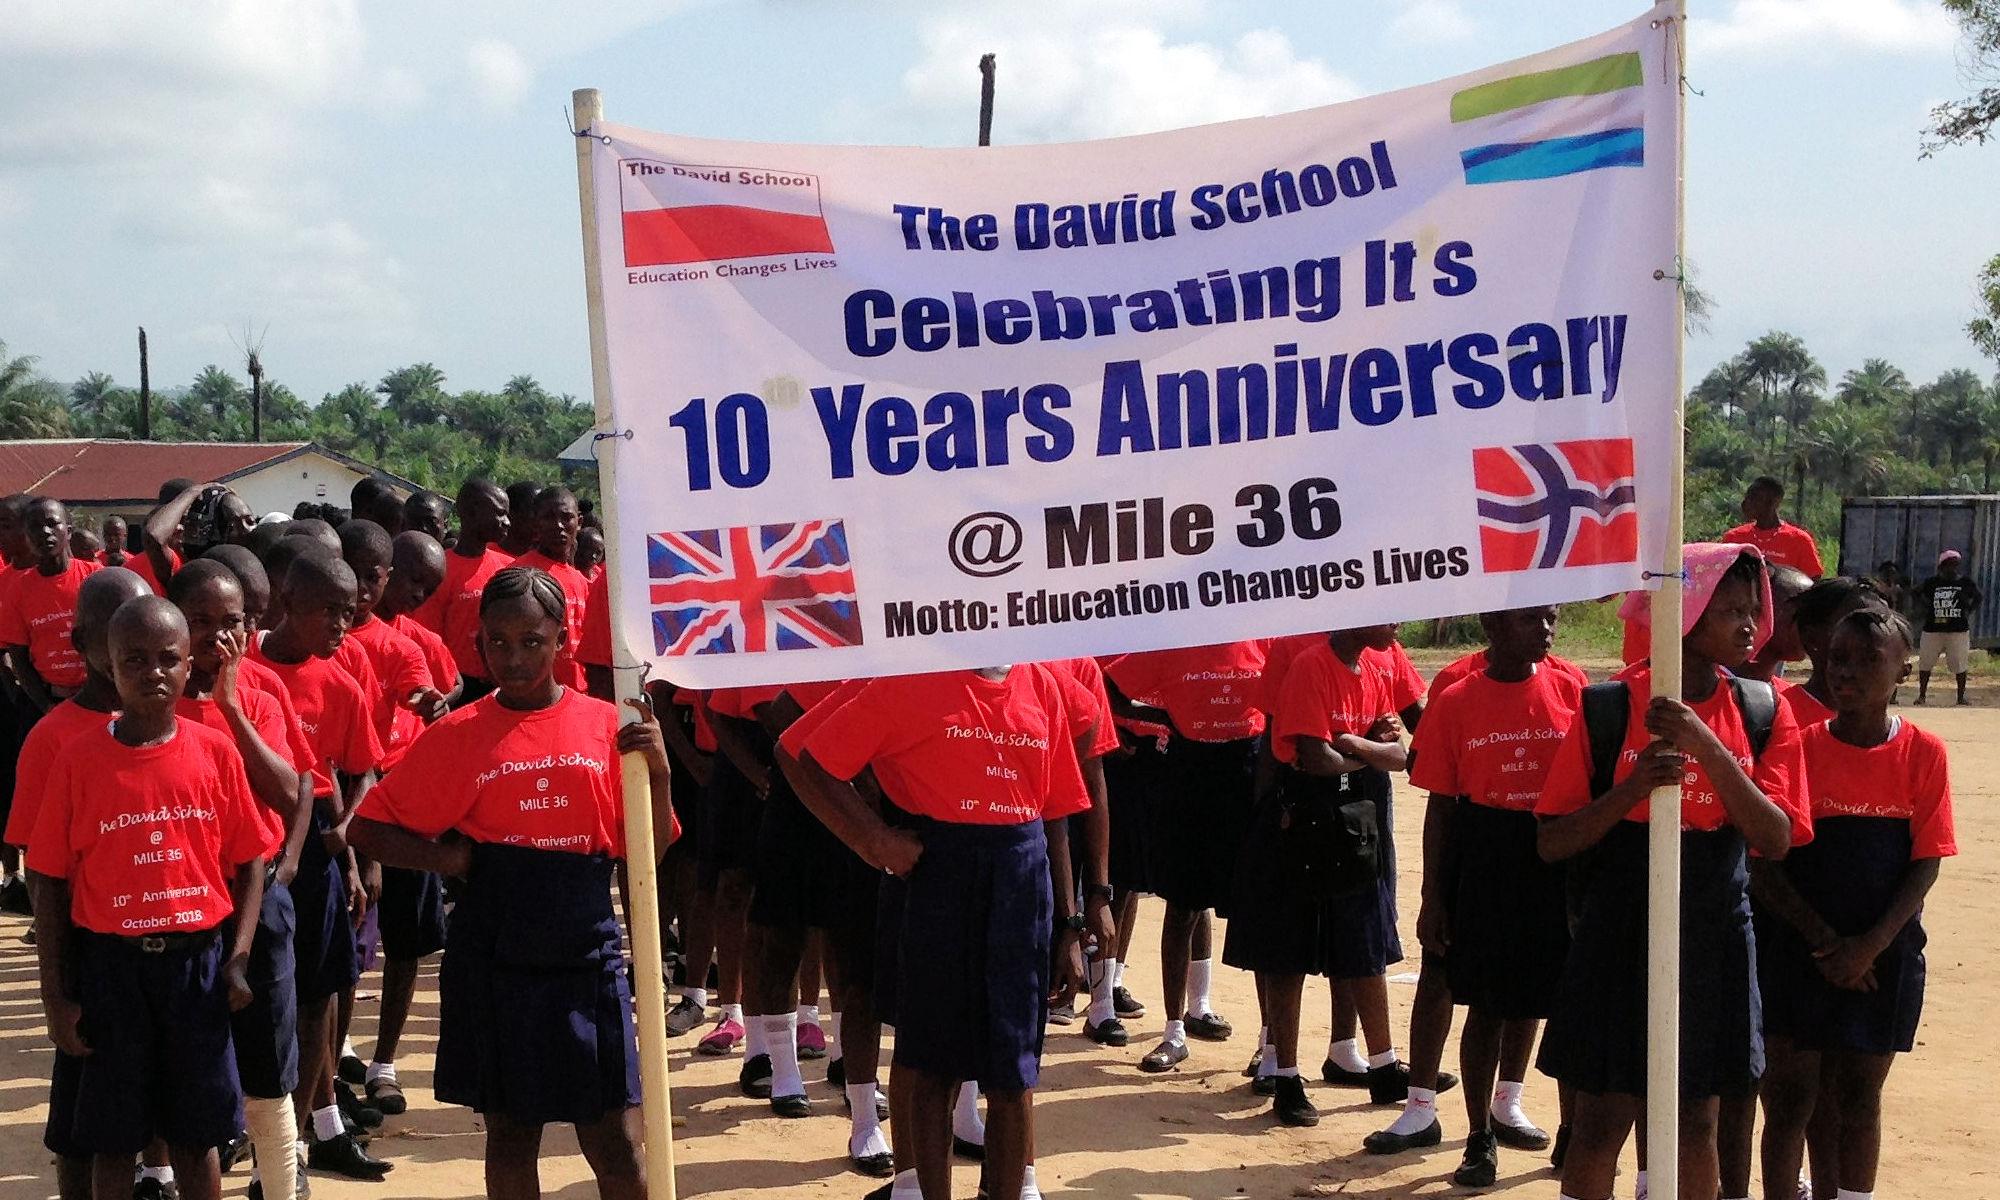 The David School